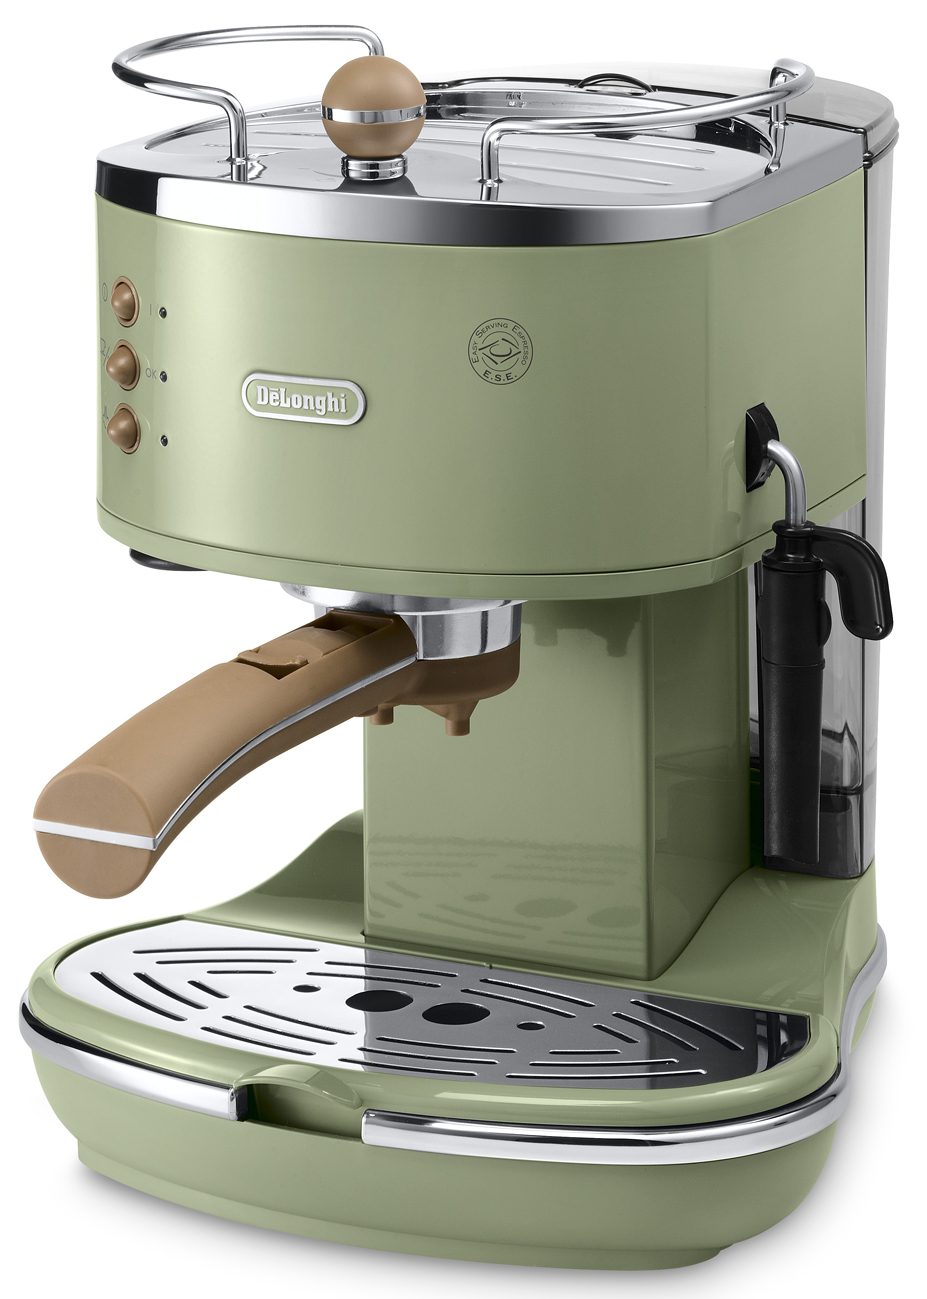 de longhi icona vintage espressomaschine ecov 310 siebtr ger f r traditionalisten. Black Bedroom Furniture Sets. Home Design Ideas